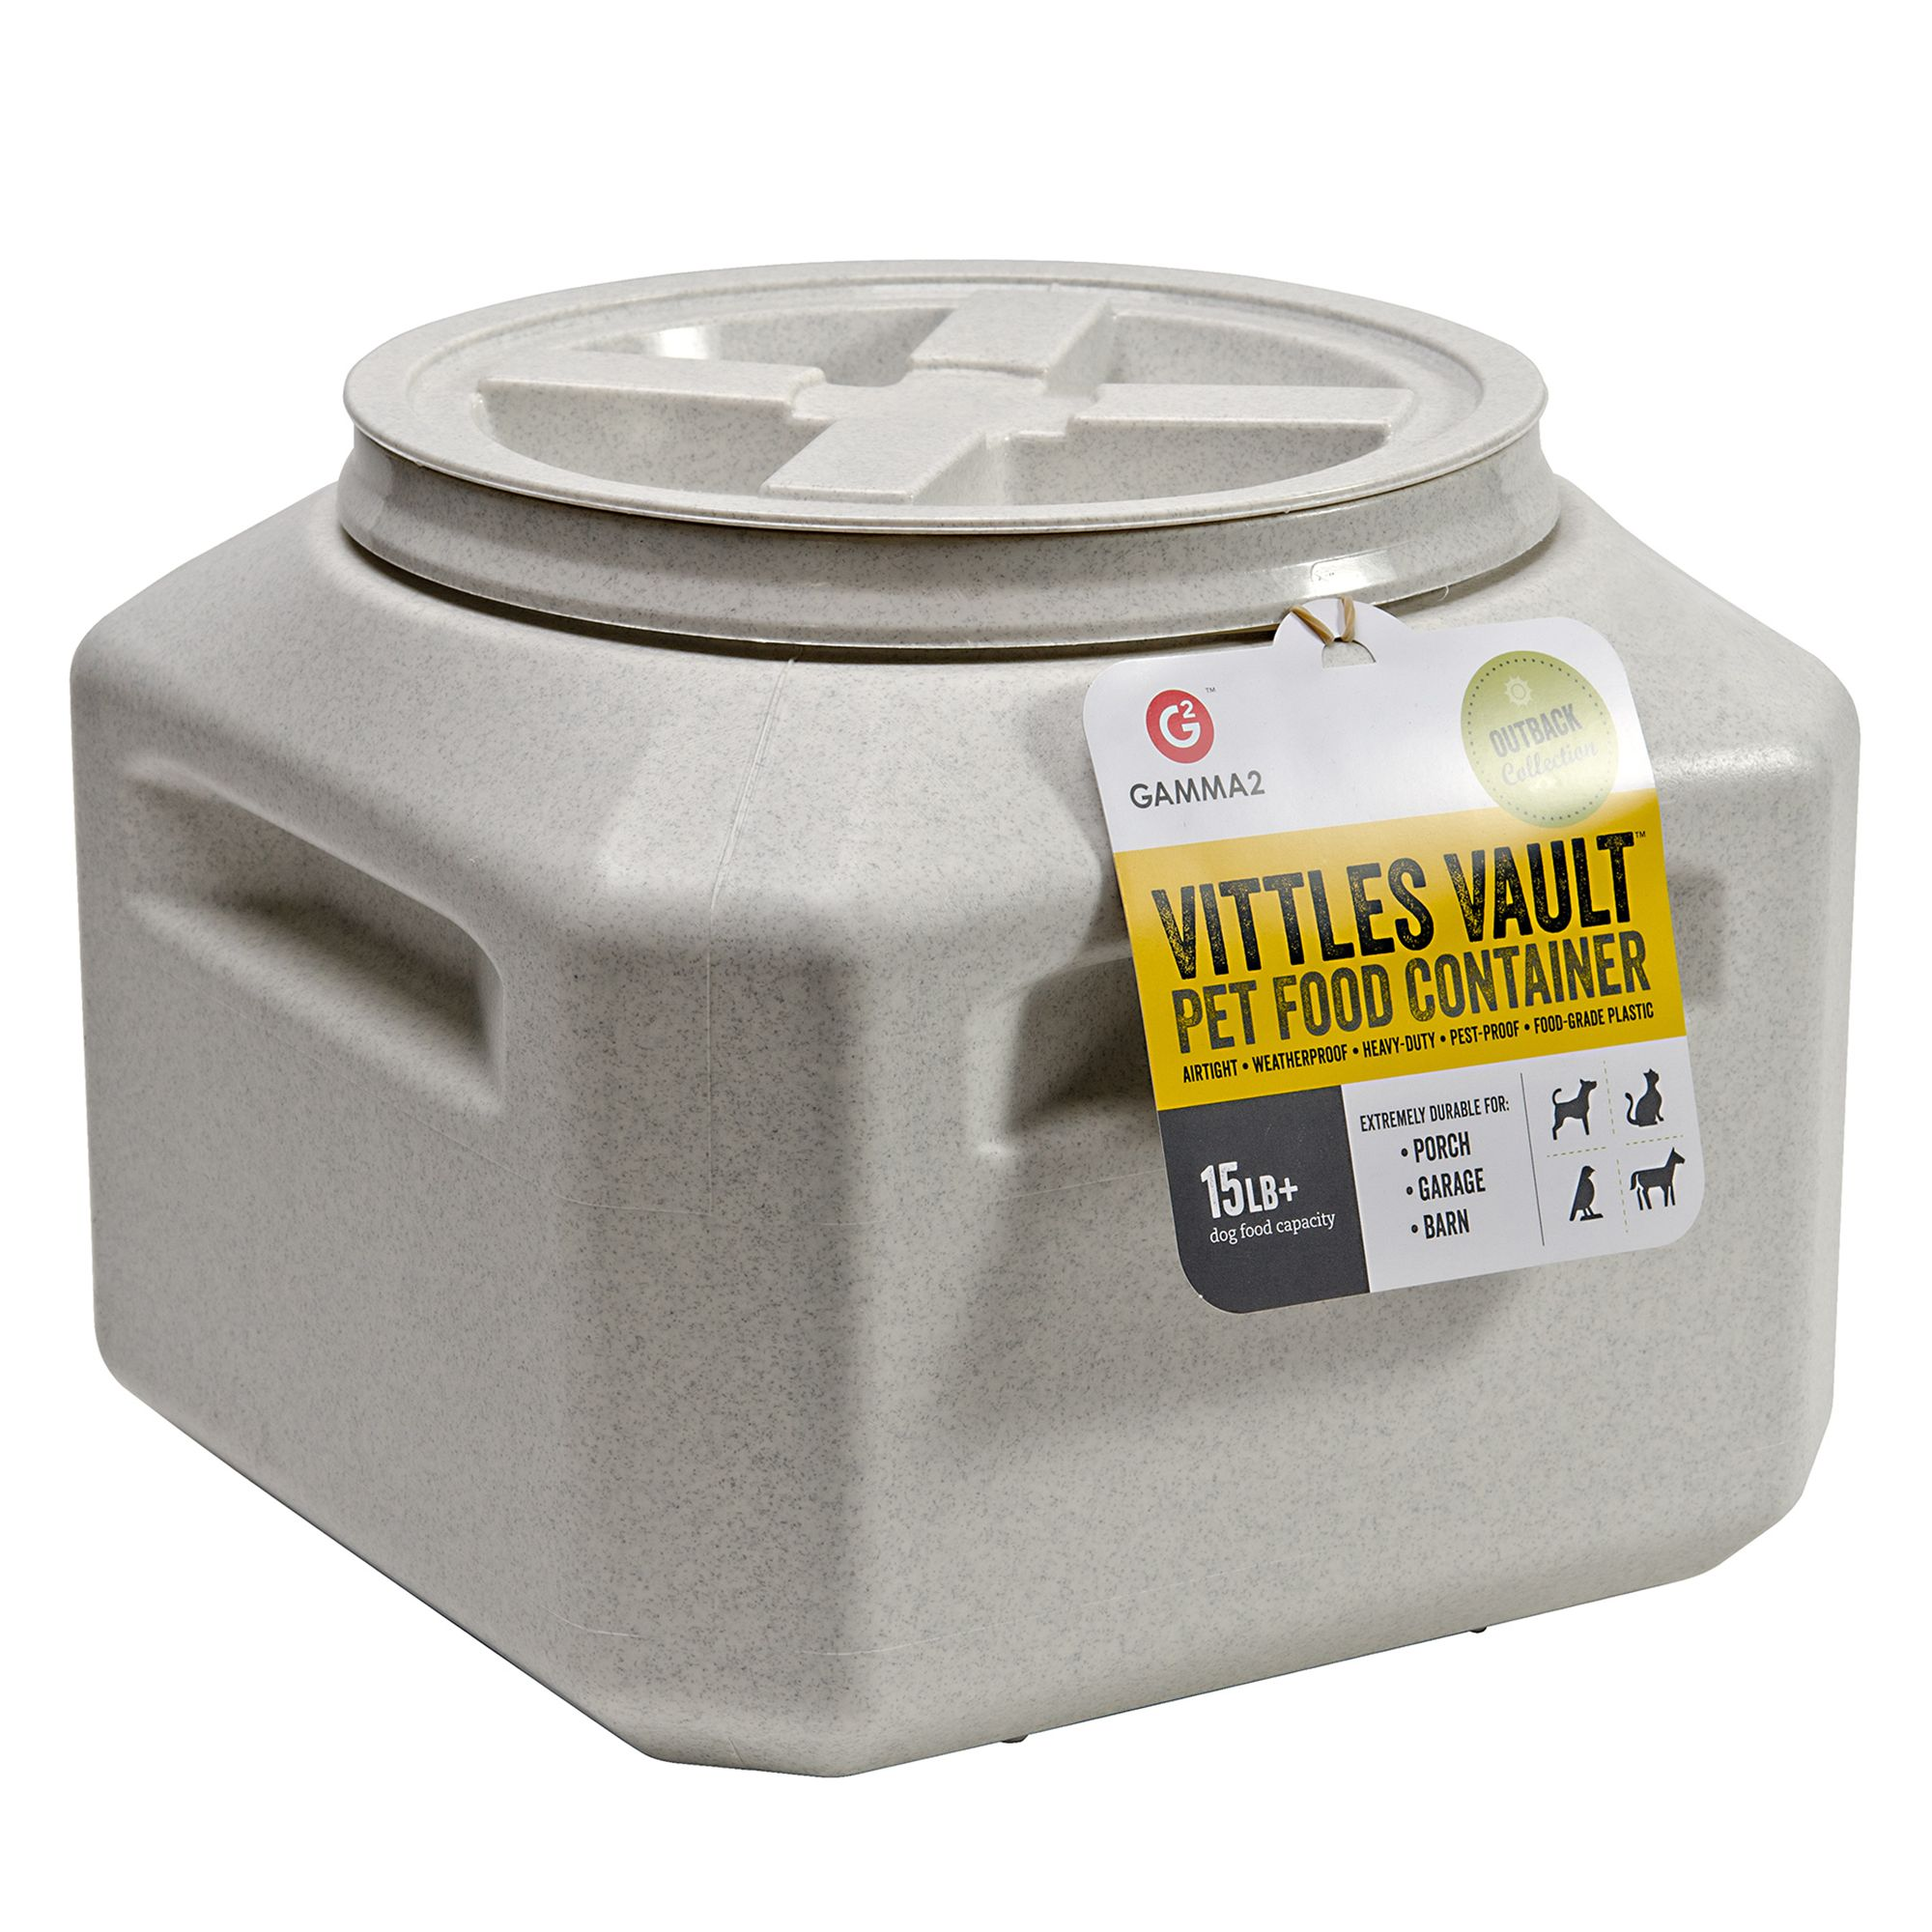 Vittle Vault Pet Food Container Size 15 Lb White